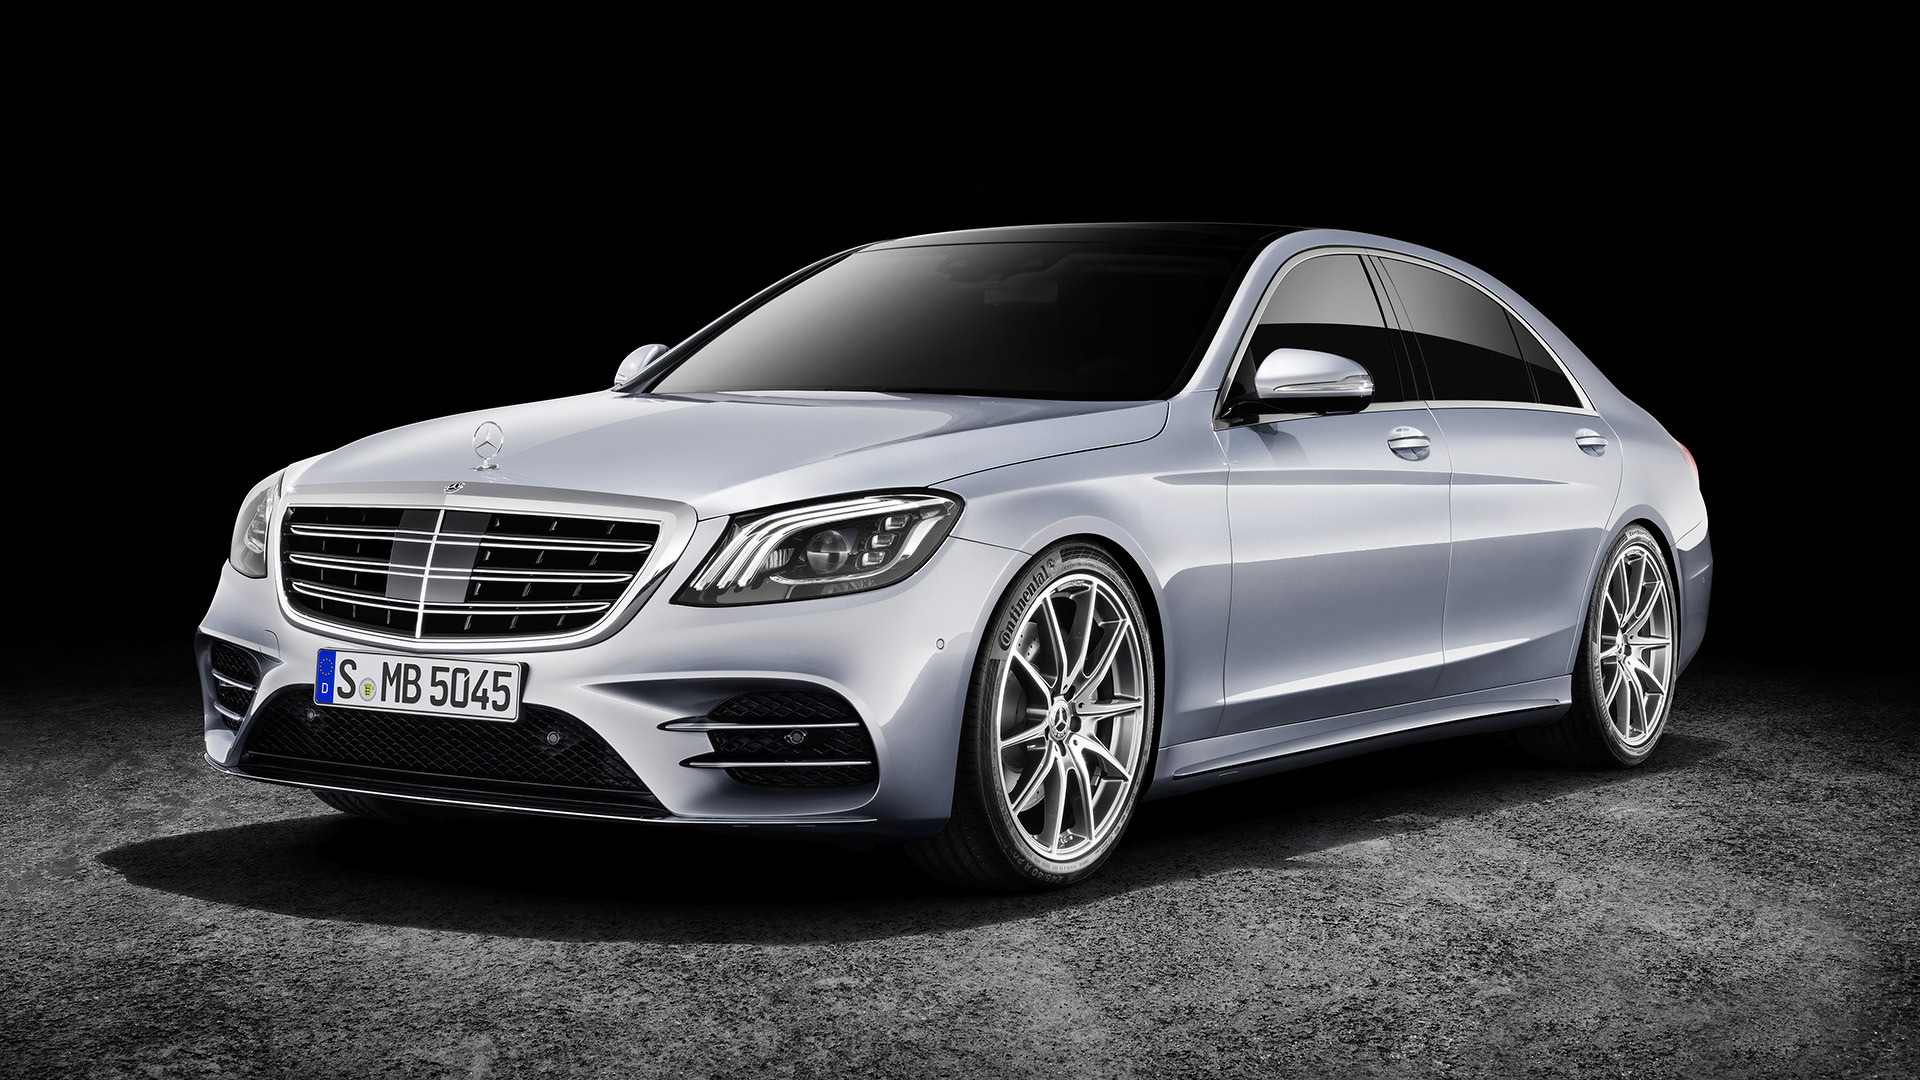 Mercedes-Benz S-Class лишится версий купе и кабриолет 1